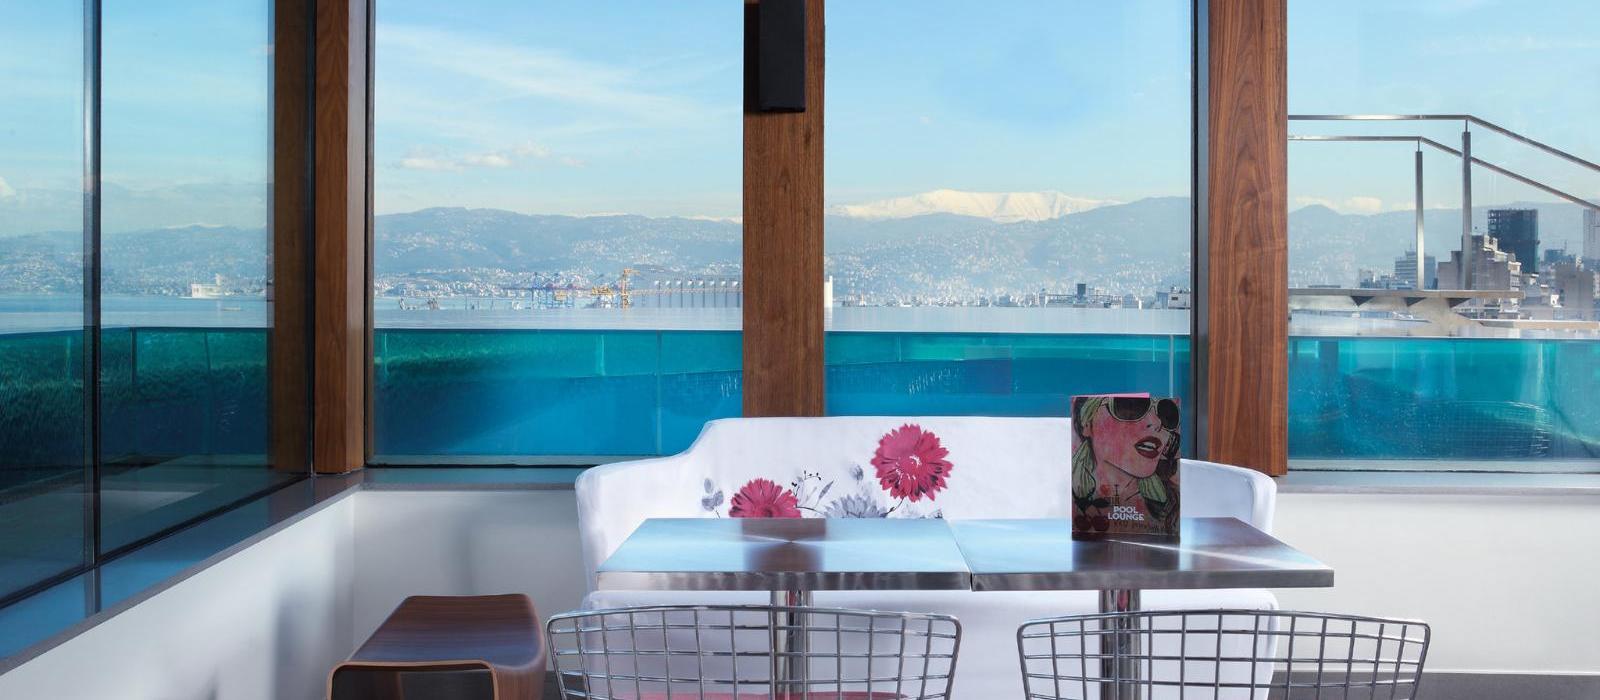 格雷精品酒店(Le Gray) 图片  www.lhw.cn